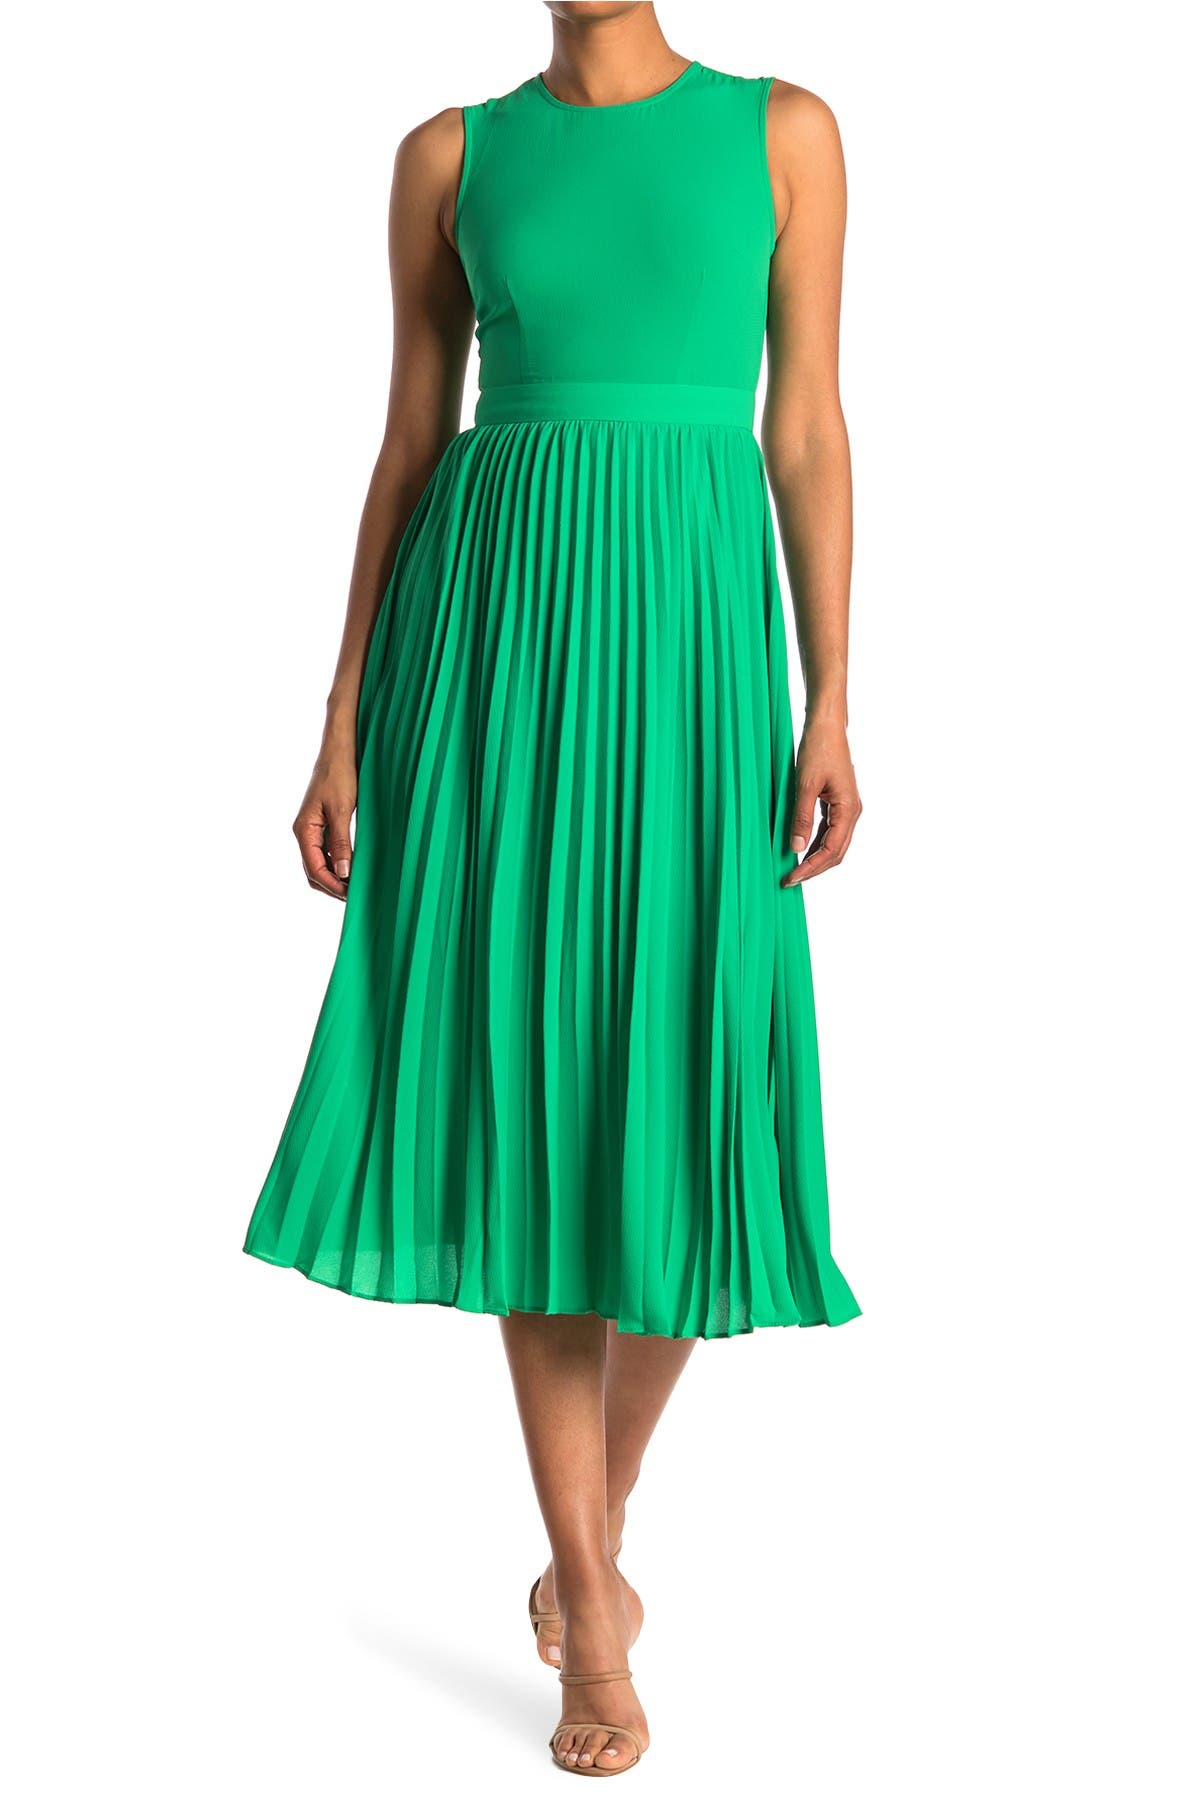 Image of Donna Morgan Sleeveless Pleated Midi Dress